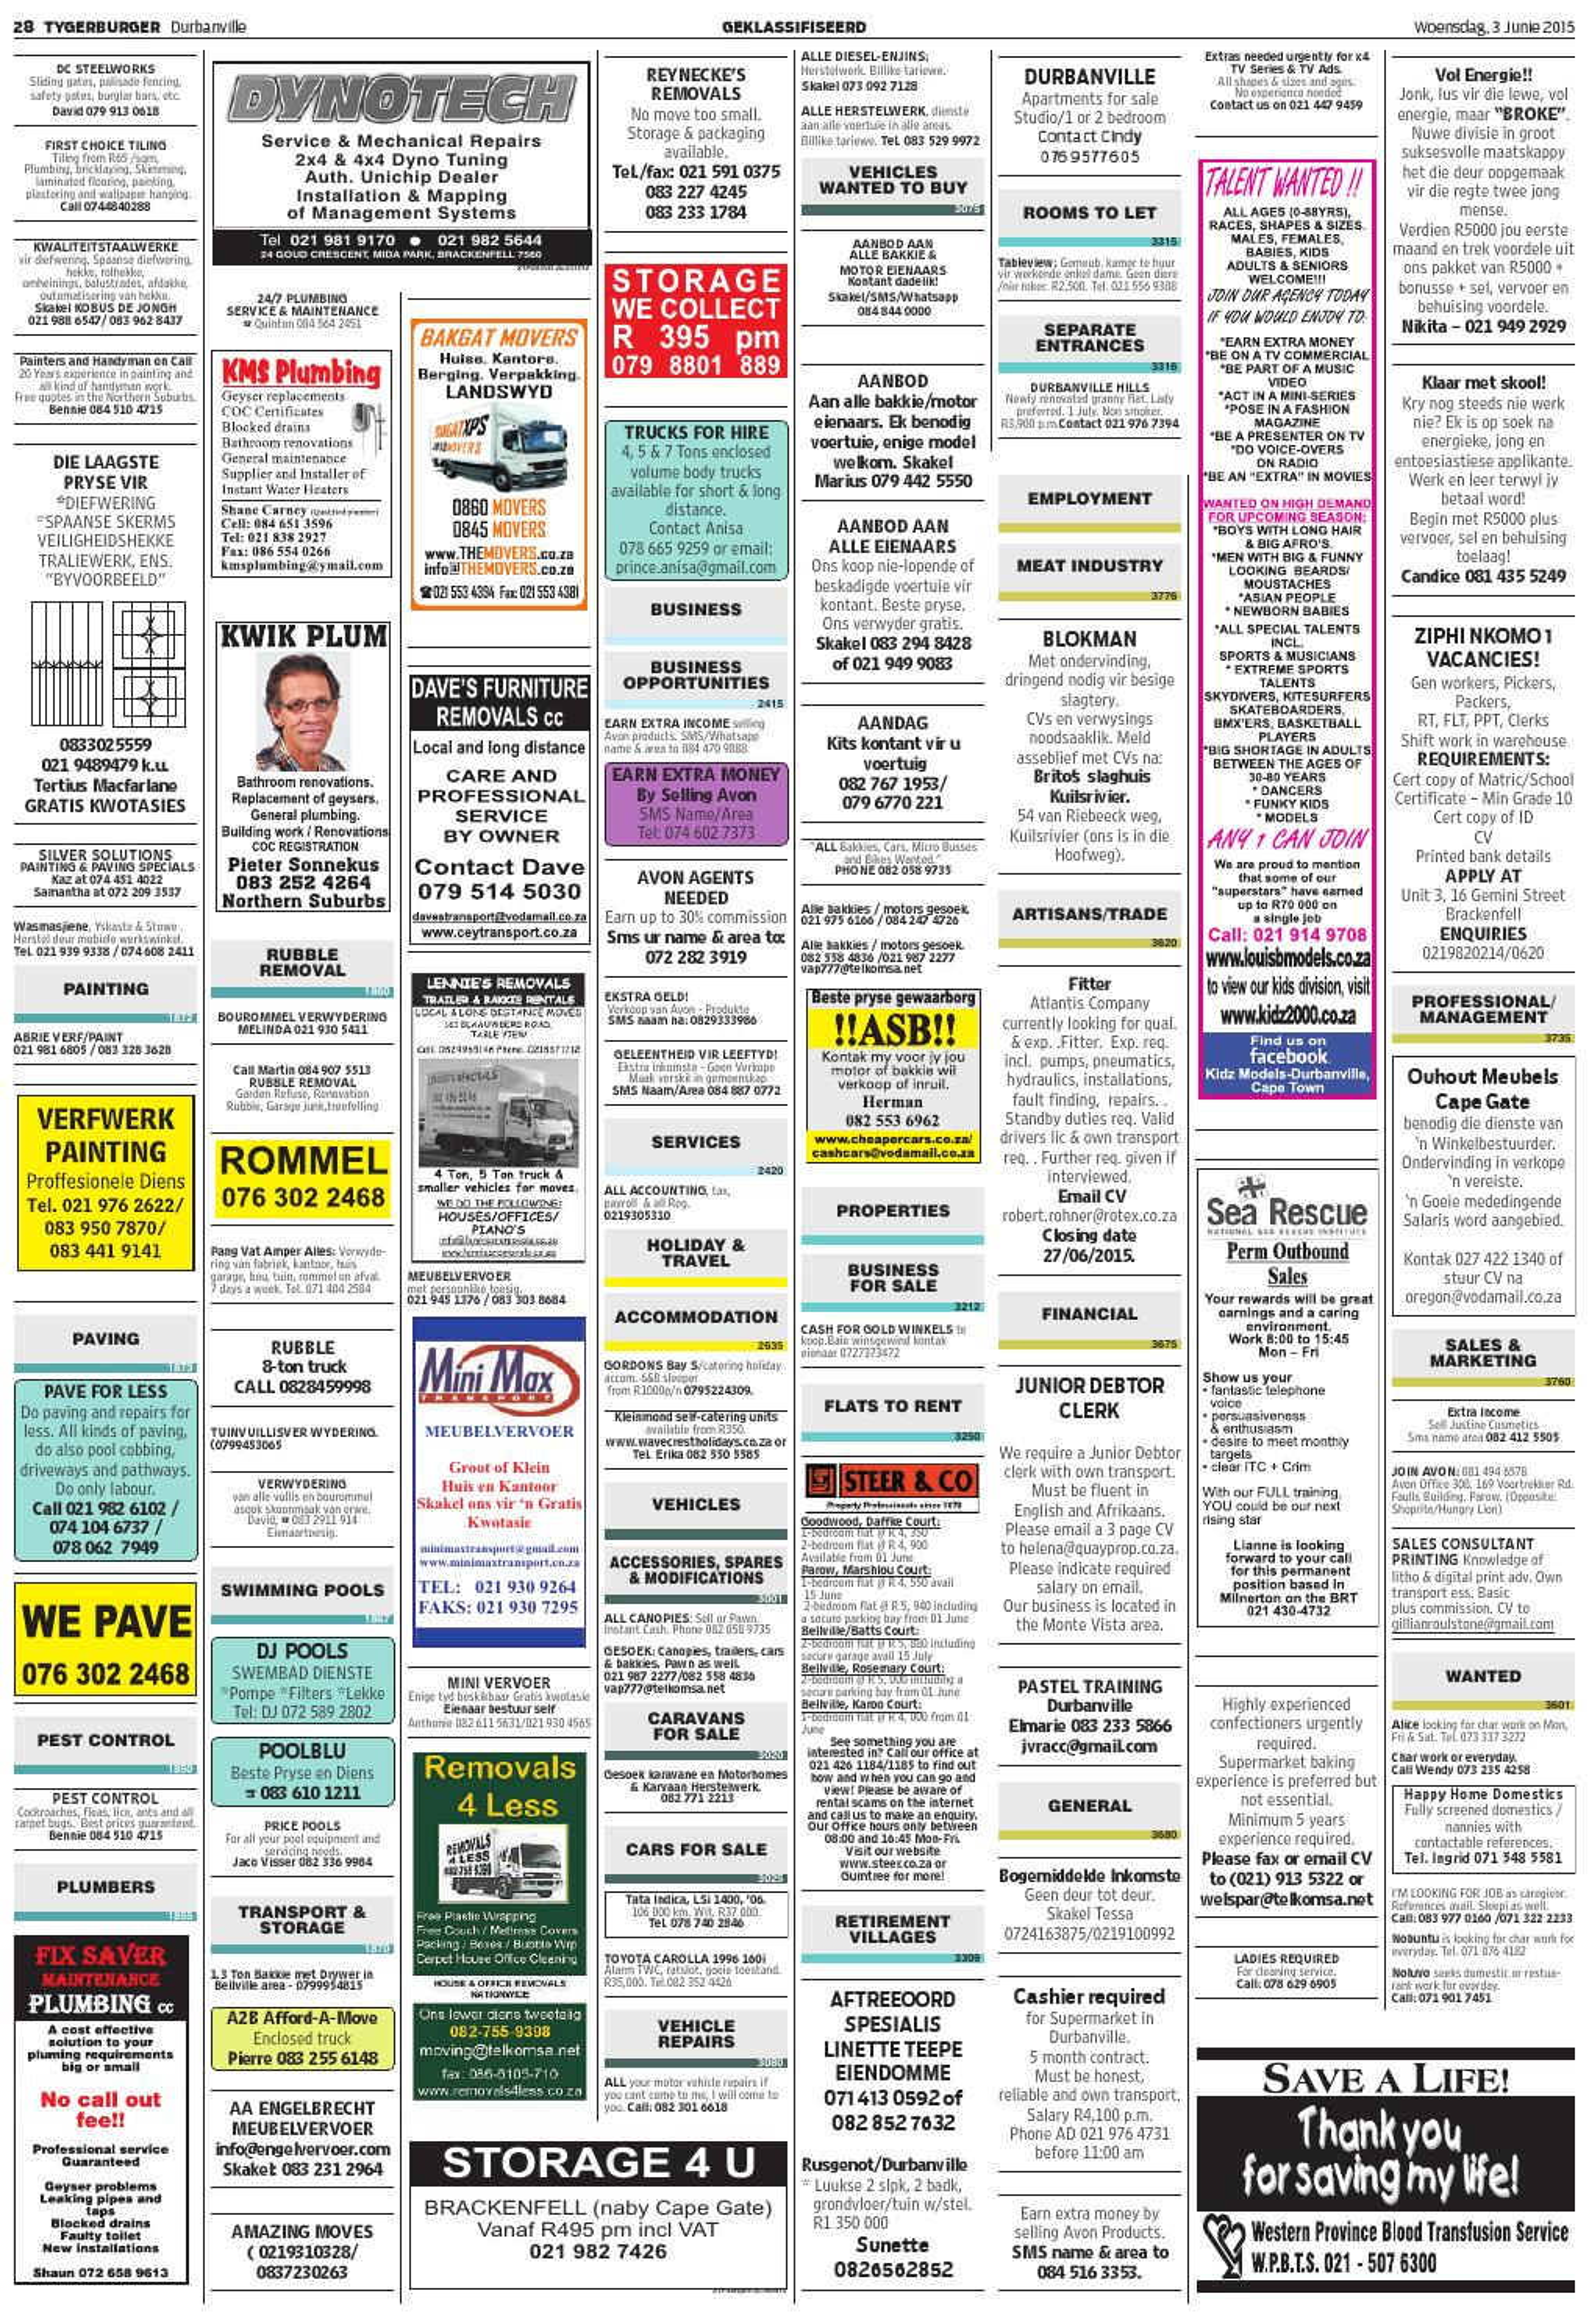 TygerBurger Durbanville 20150603 by Tygerburger Newspaper